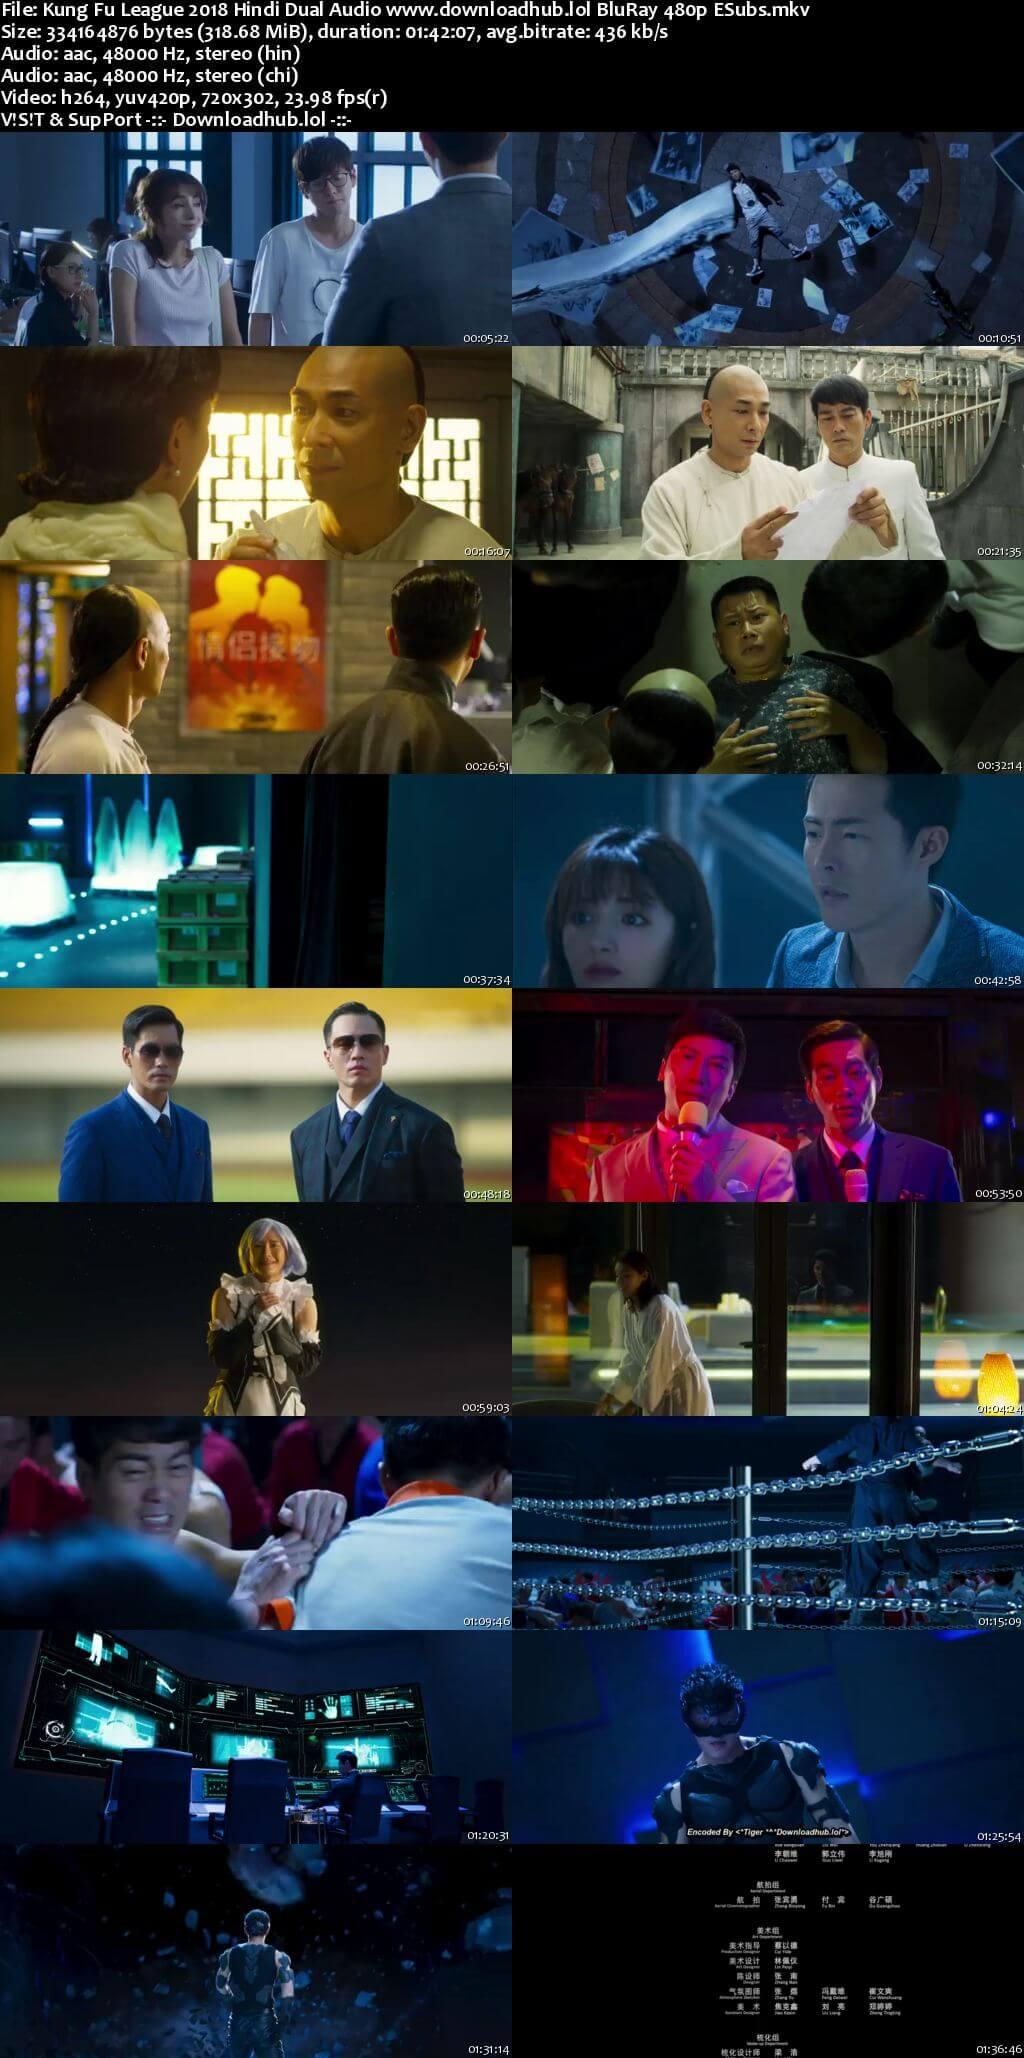 Kung Fu League 2018 Hindi Dual Audio 300MB BluRay 480p ESubs